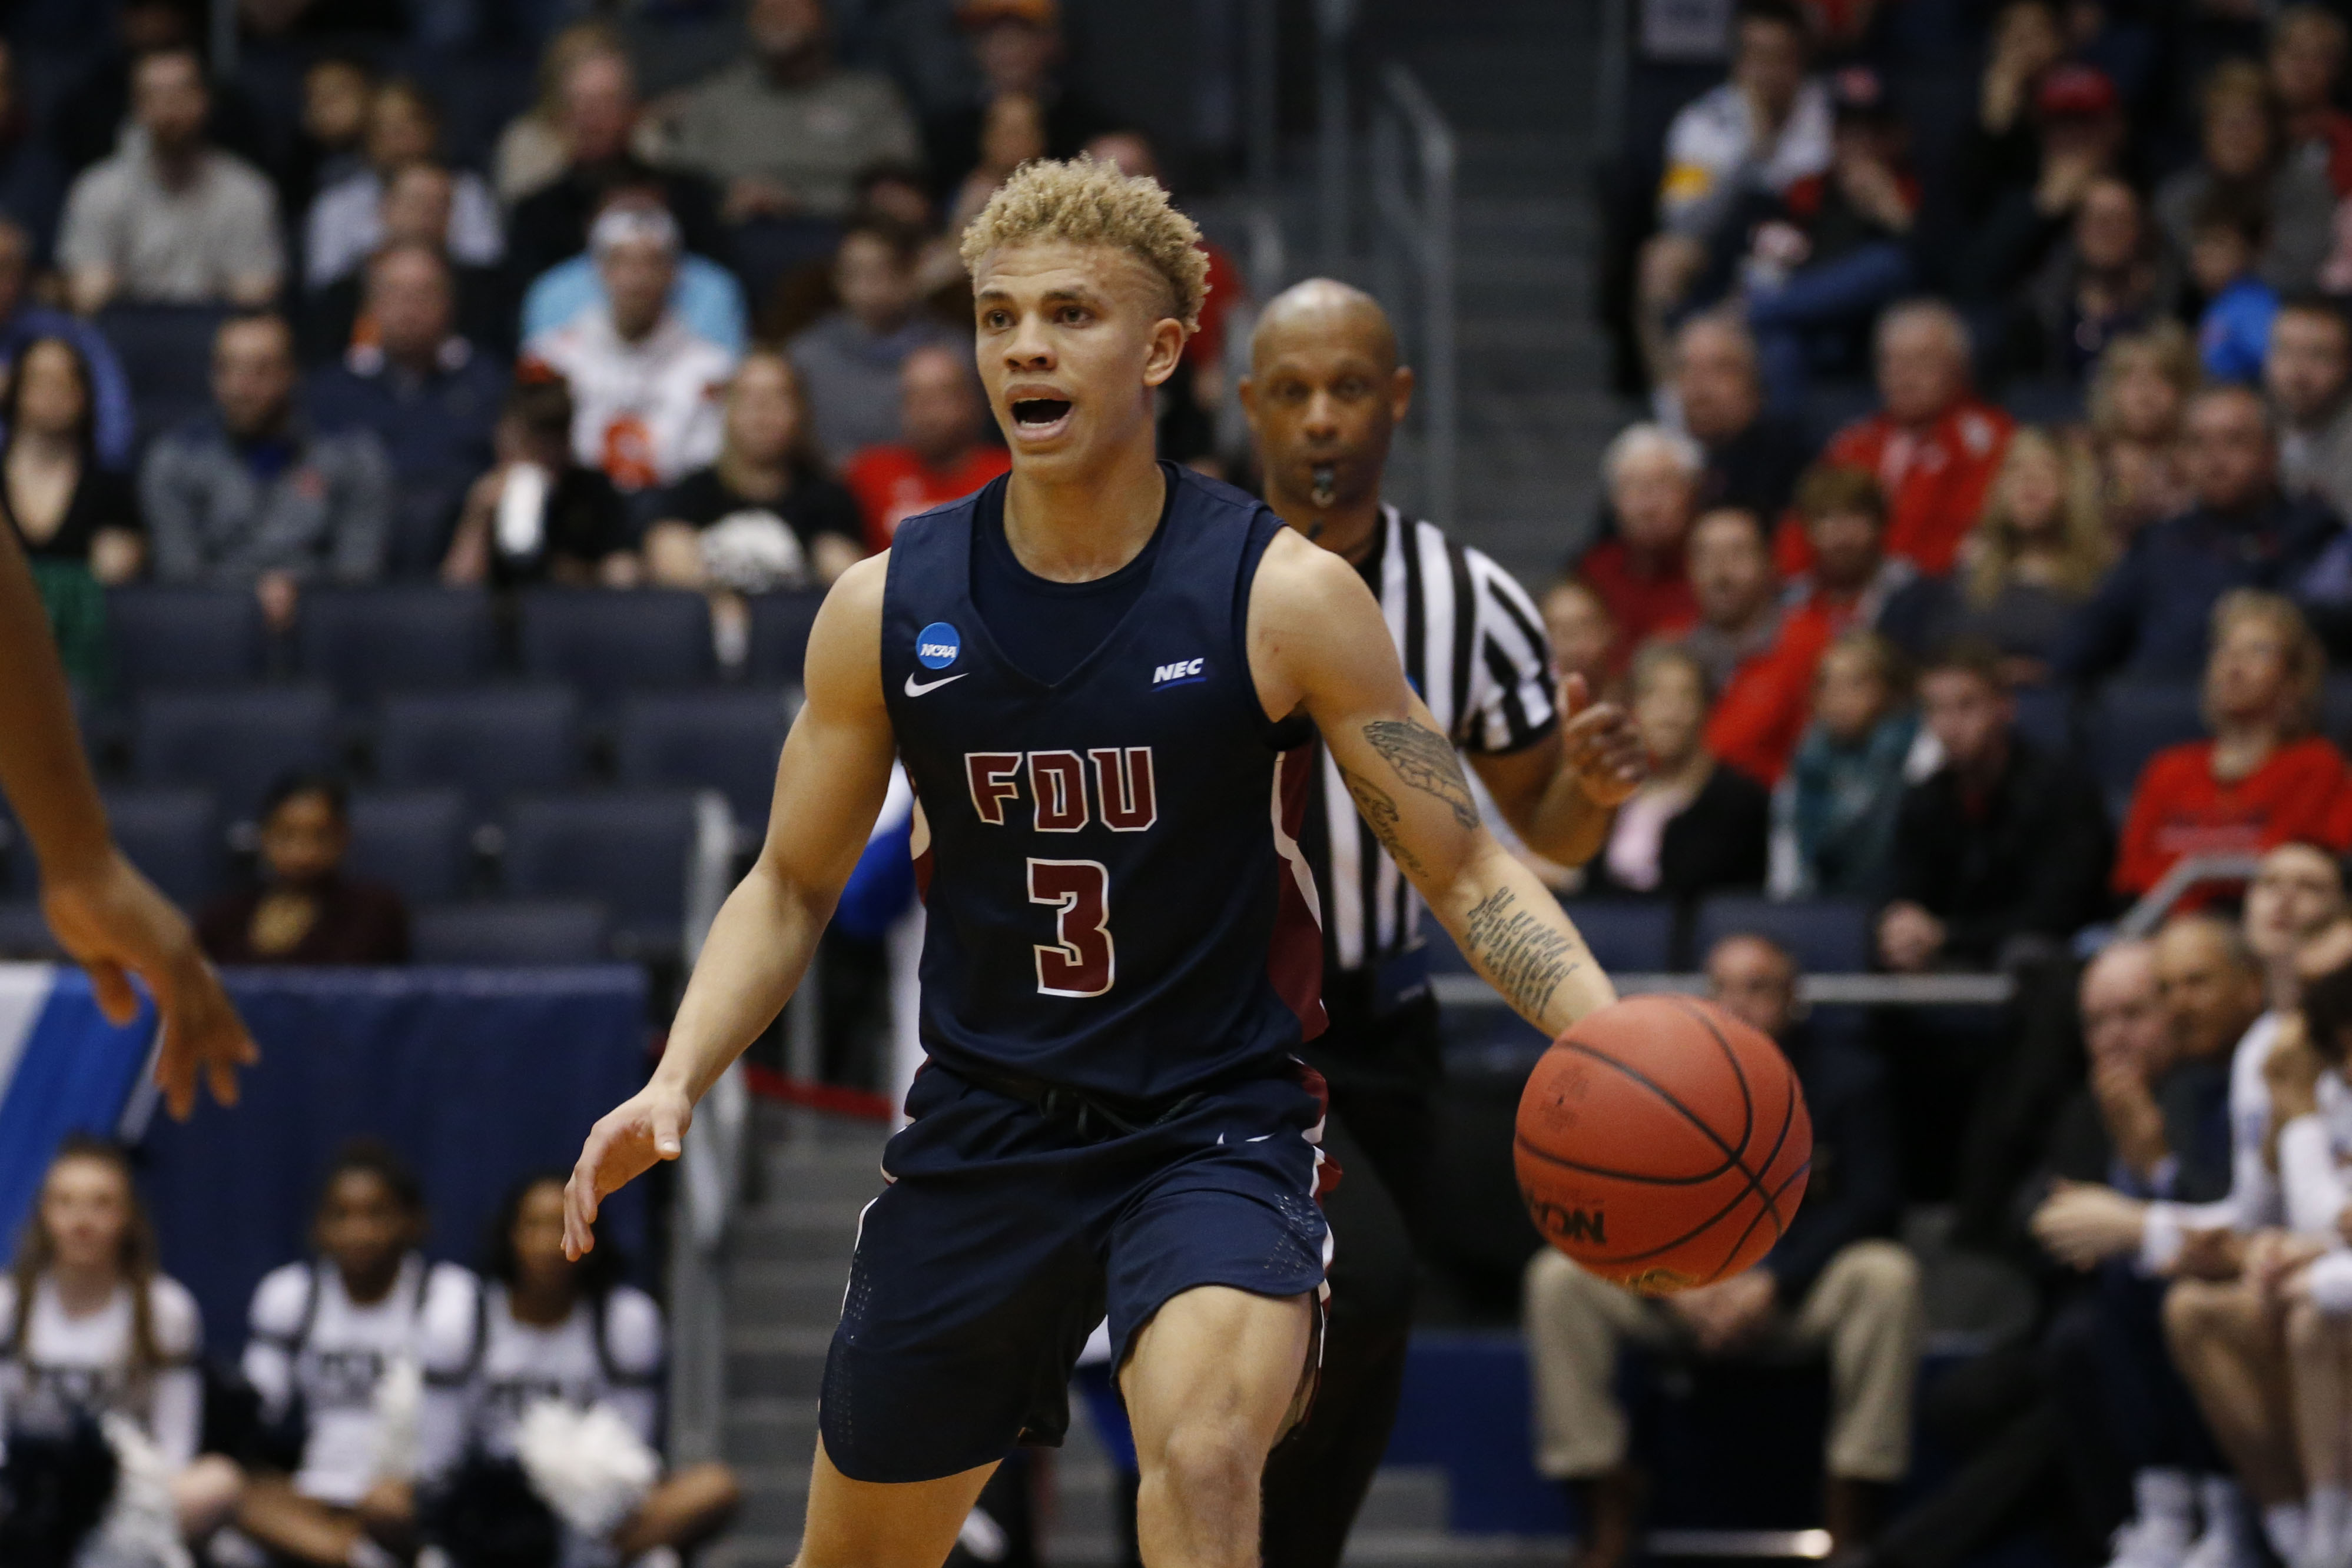 NCAA Basketball: NCAA Tournament First Four- Fairleigh Dickinson Knights vs Prairie View A&M Panthers